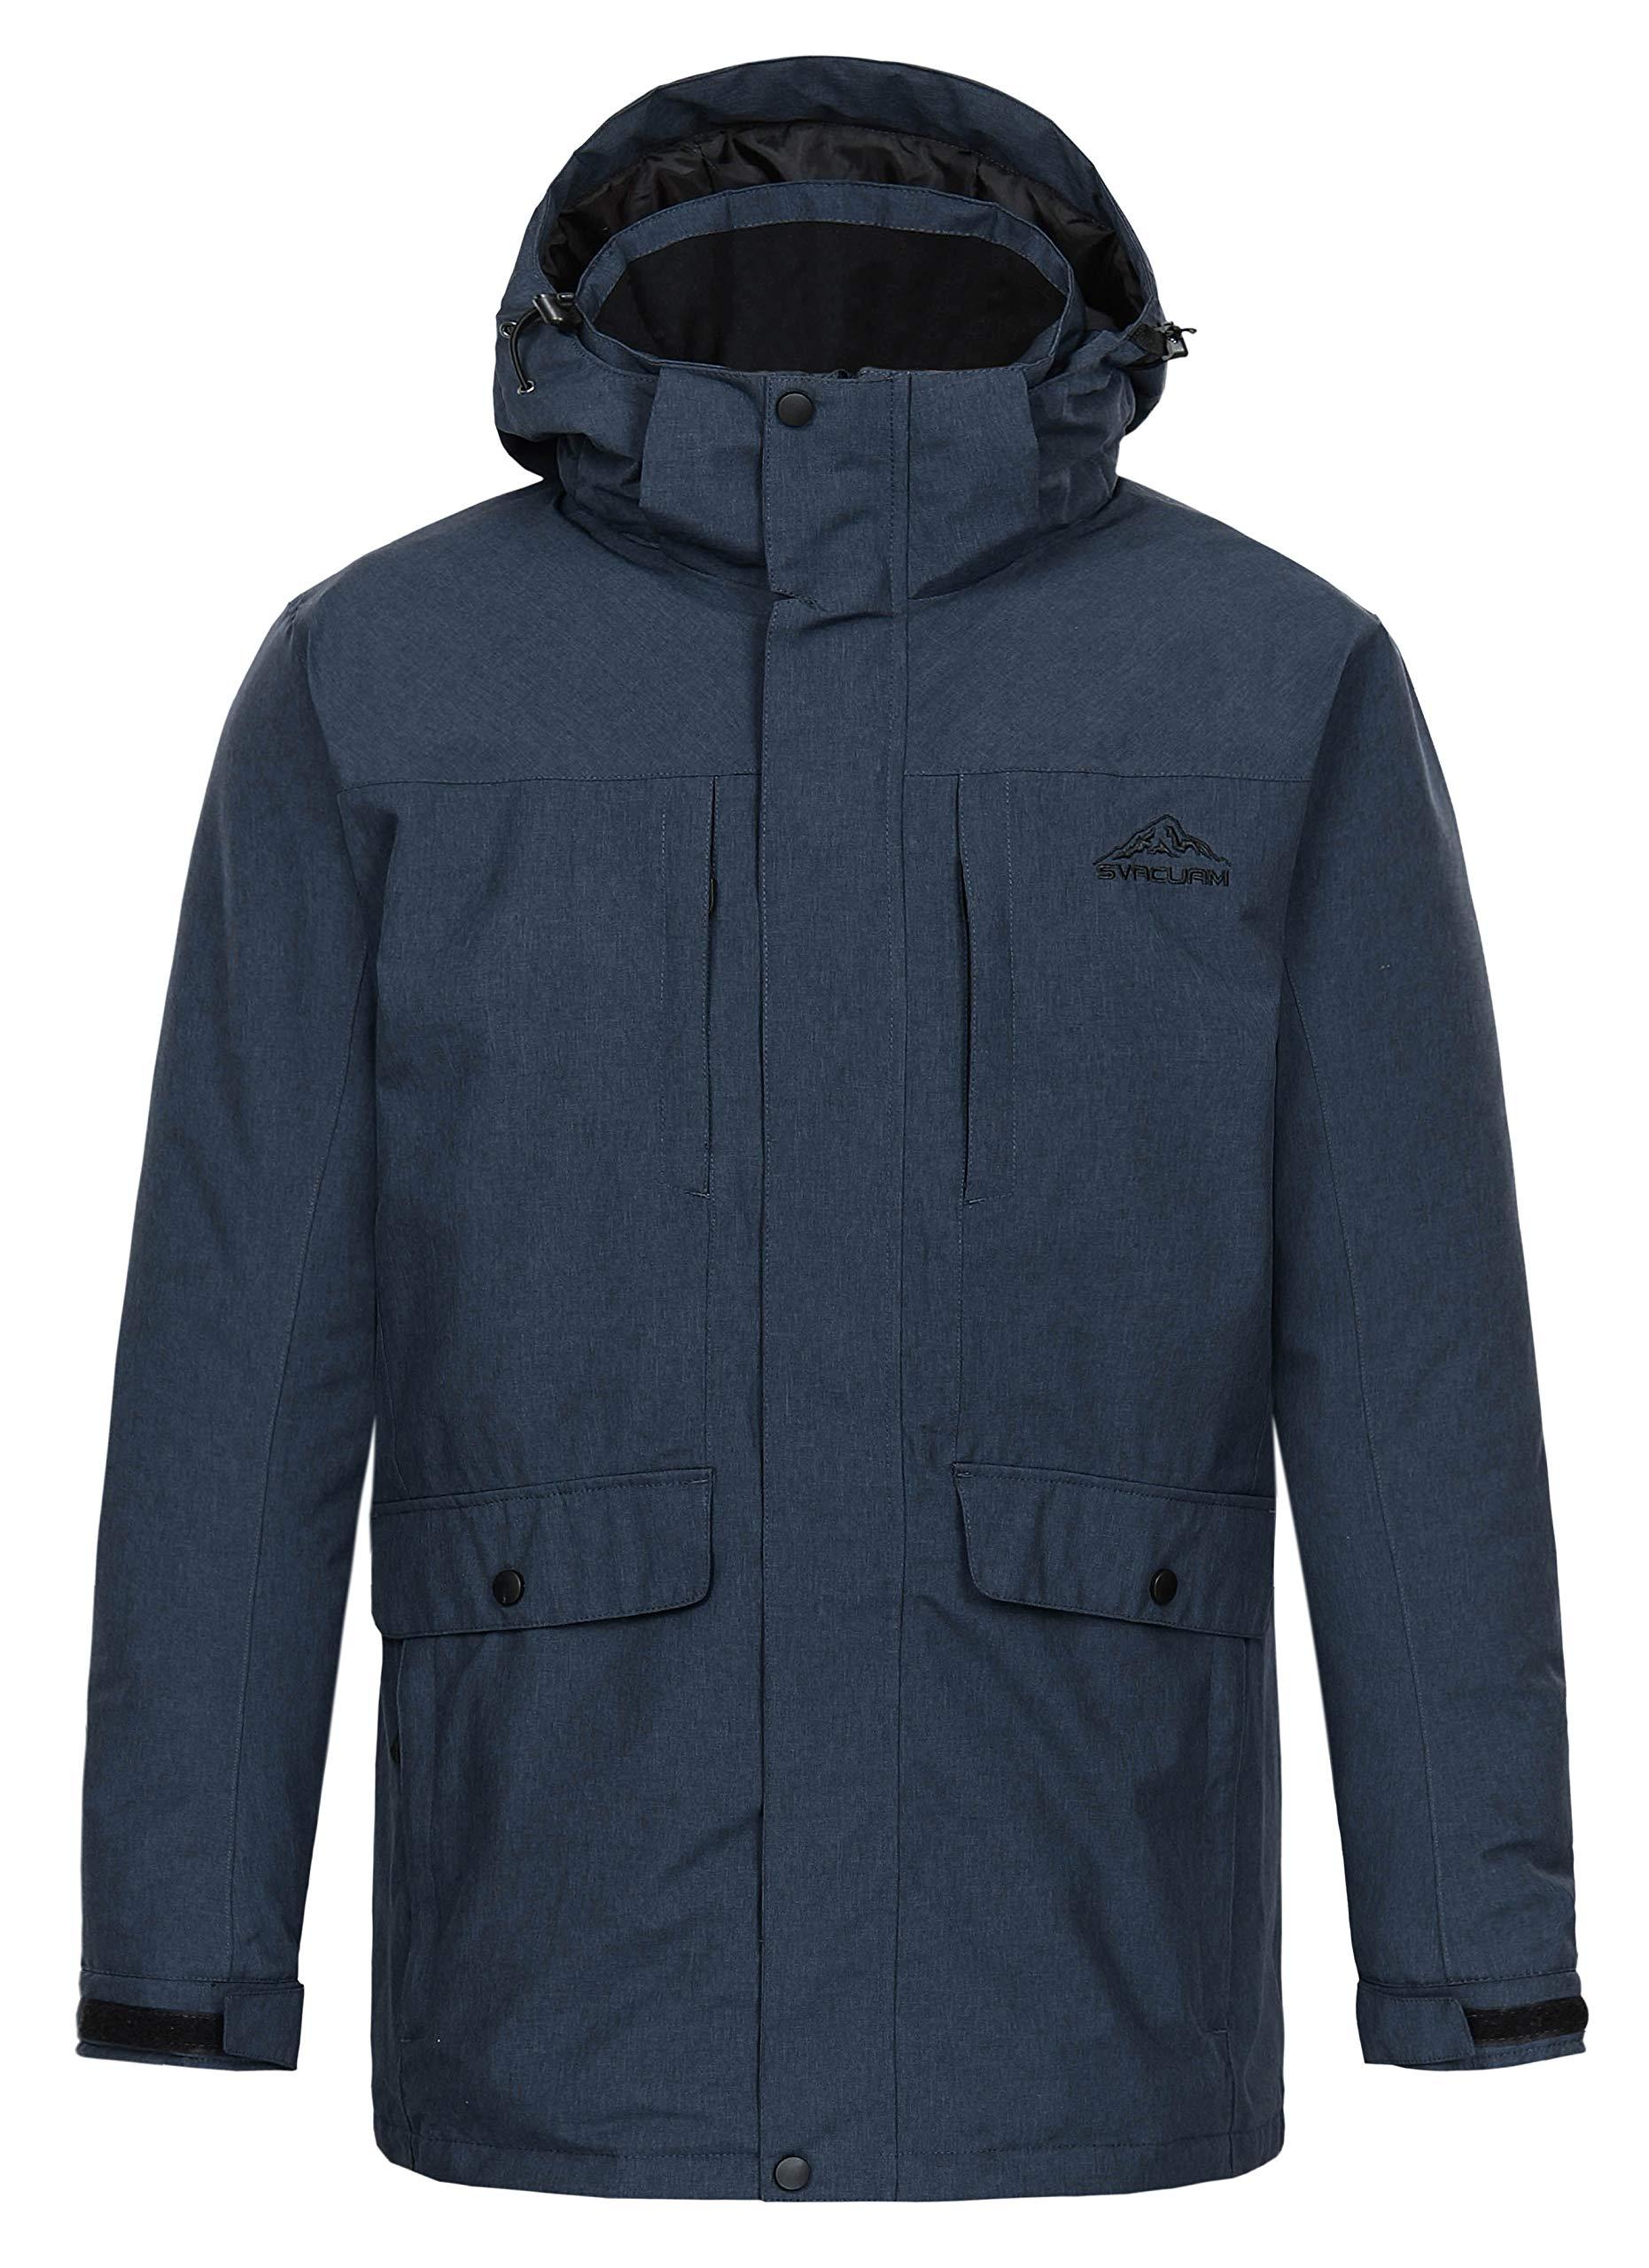 svacuam Men's Outdoor Lined Hooded Waterproof Insulated Winter Parka Rain Jacket Anorak Puffer Coat